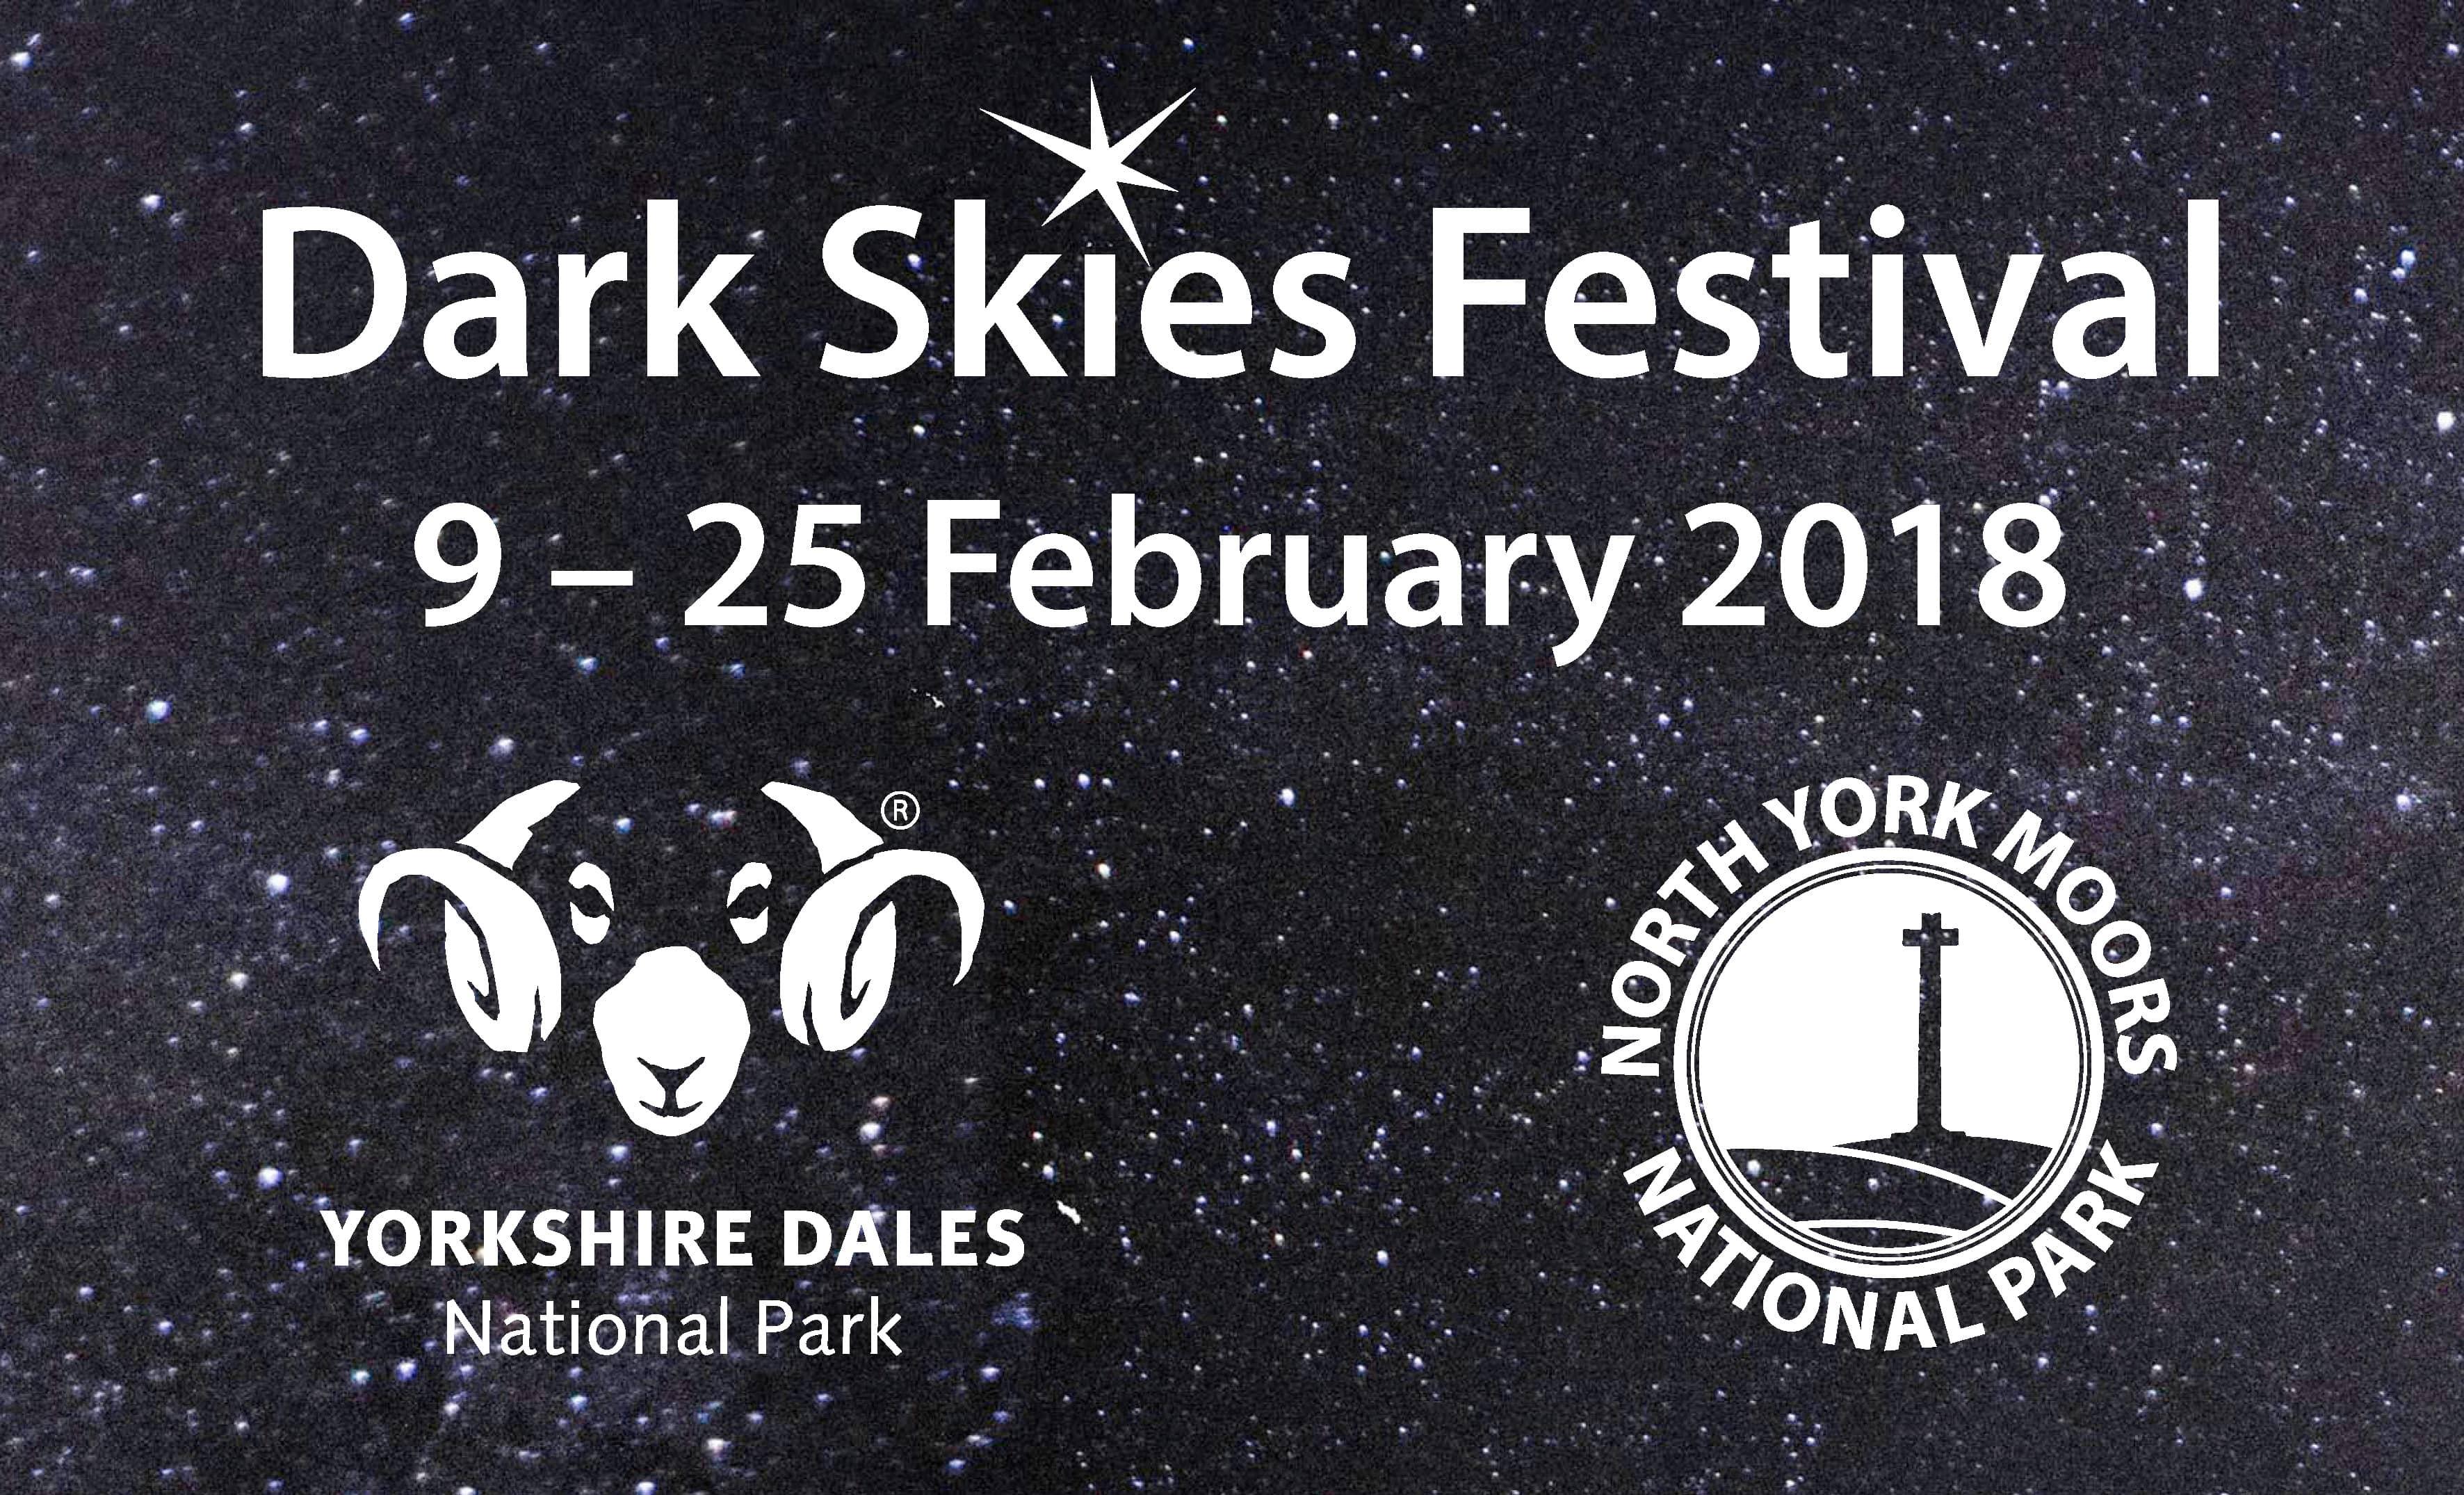 Dark Skies Festival